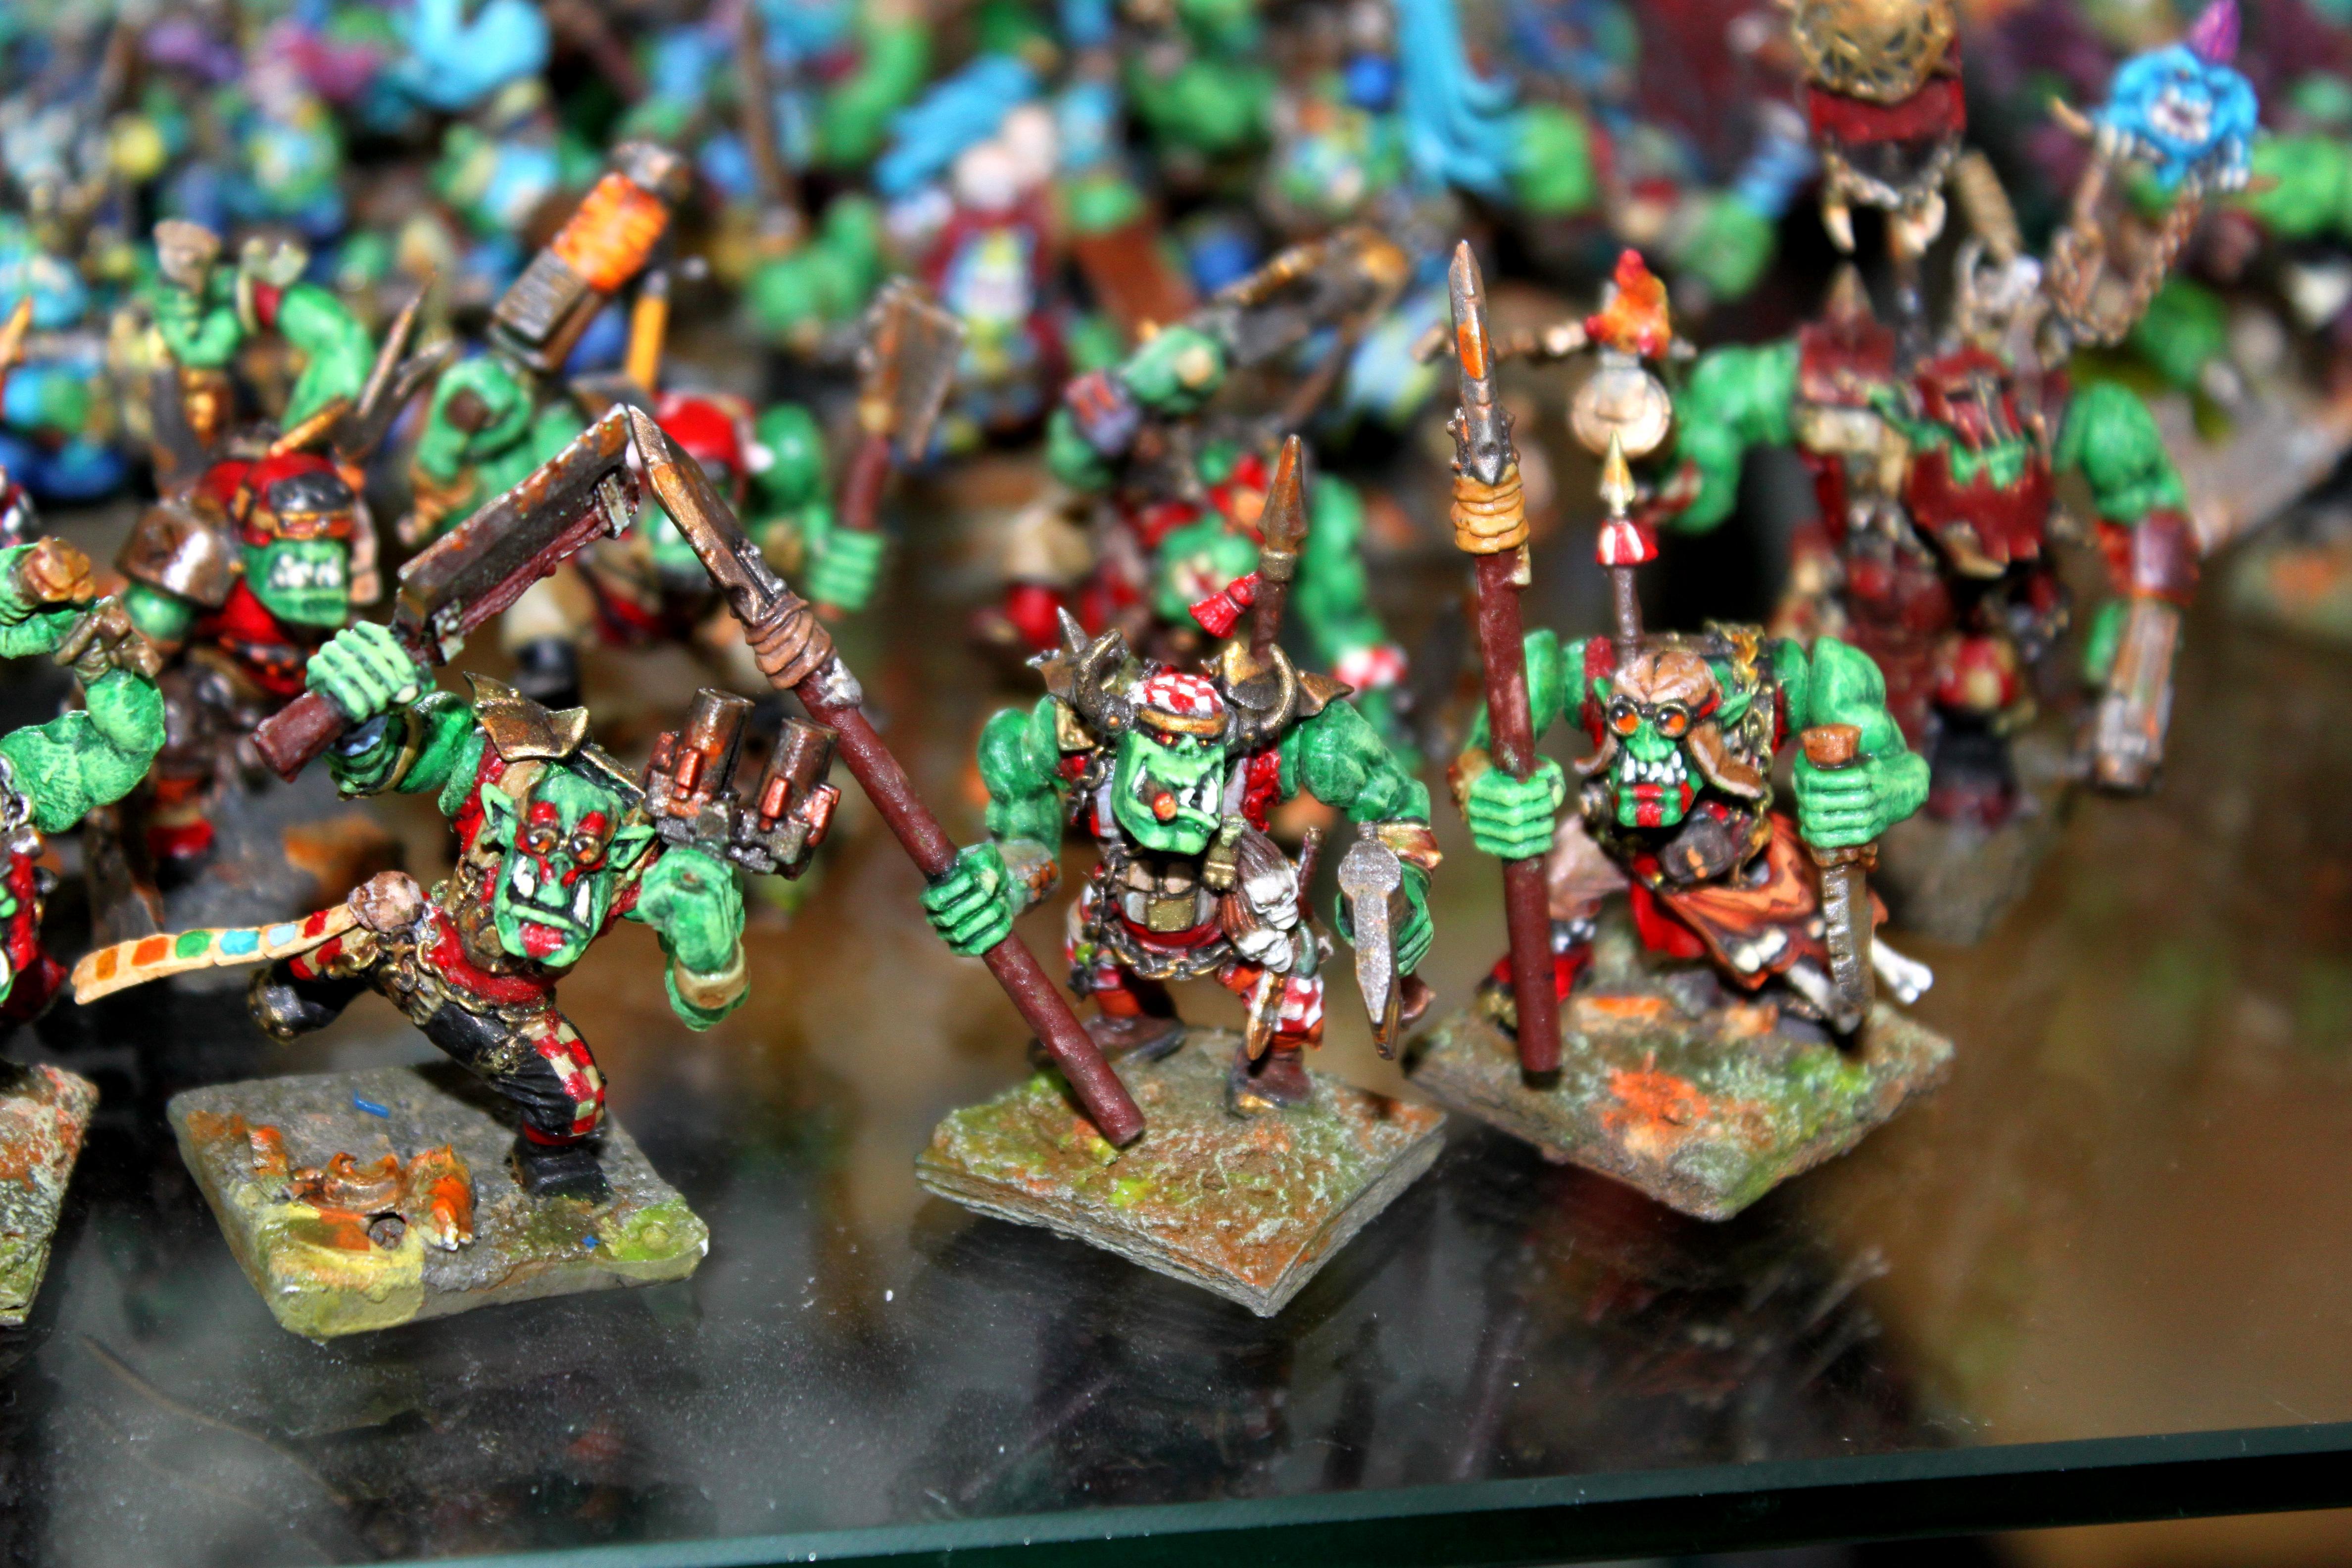 Conversion, Evil Sunz, Magnet, Miniature, Orks, Warhammer 40,000, Warhammer Fantasy